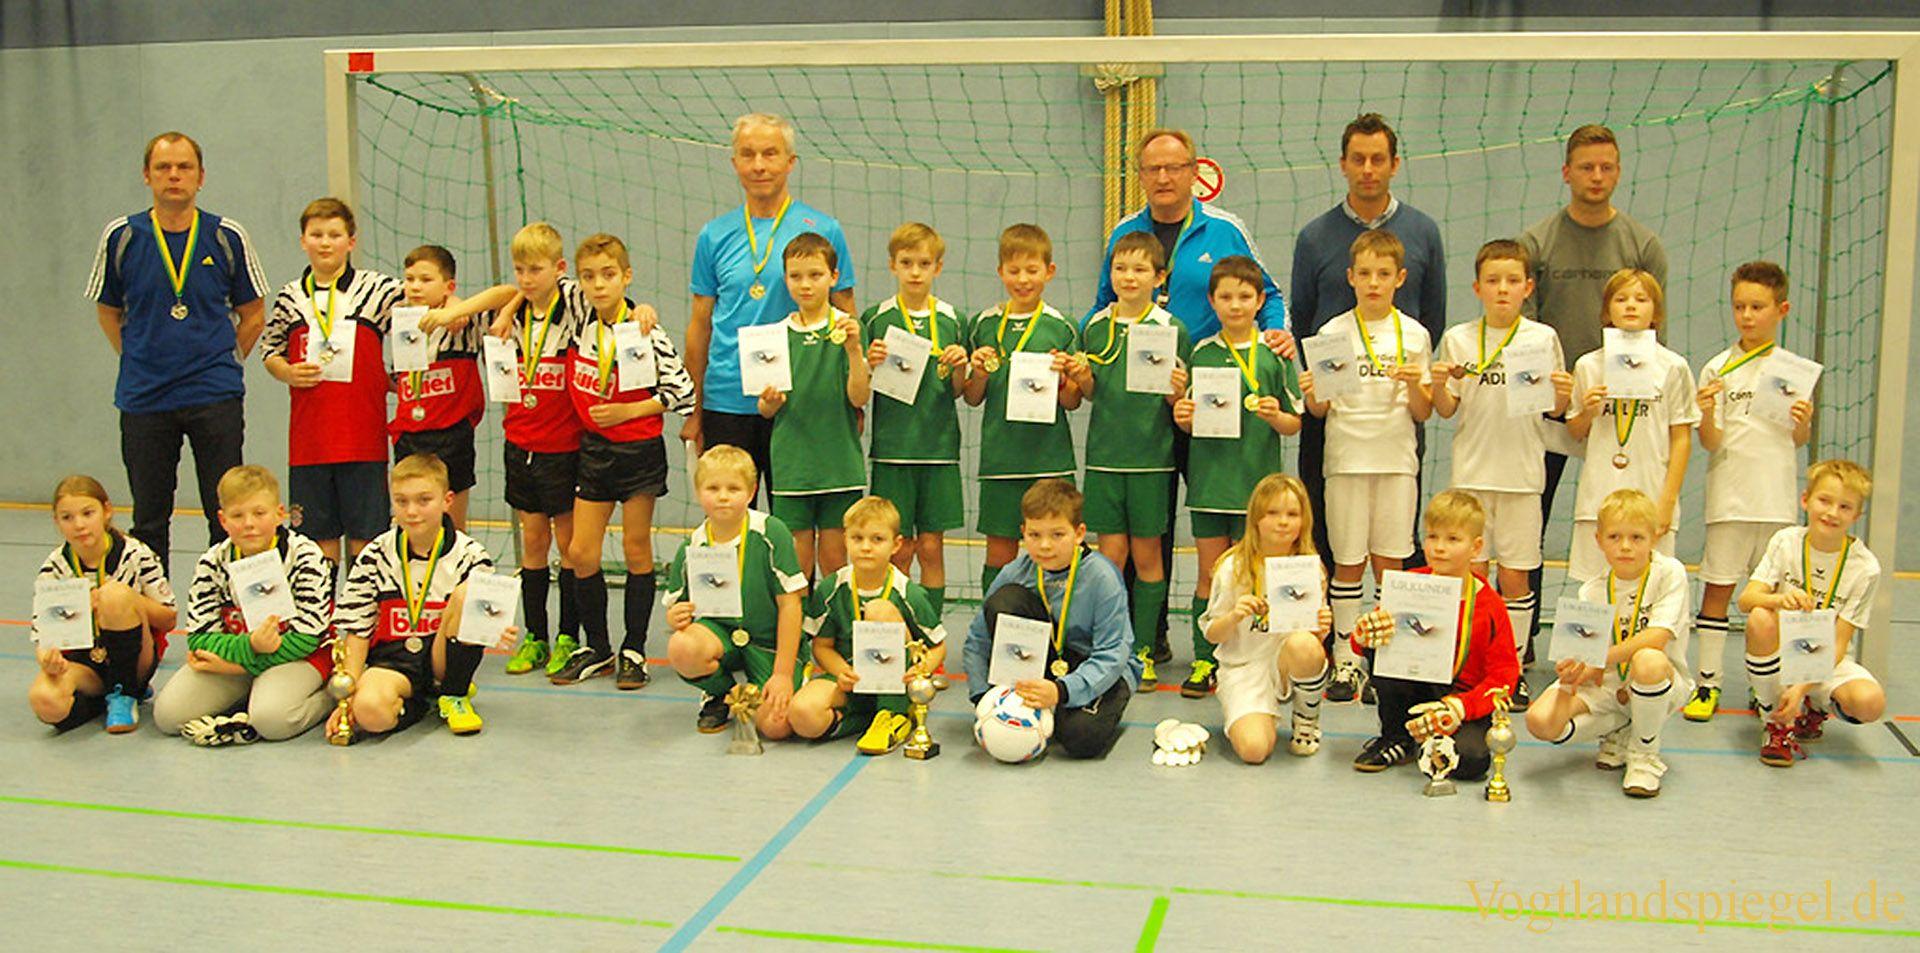 Rudi-Geiger-Pokal im Hallenfußball